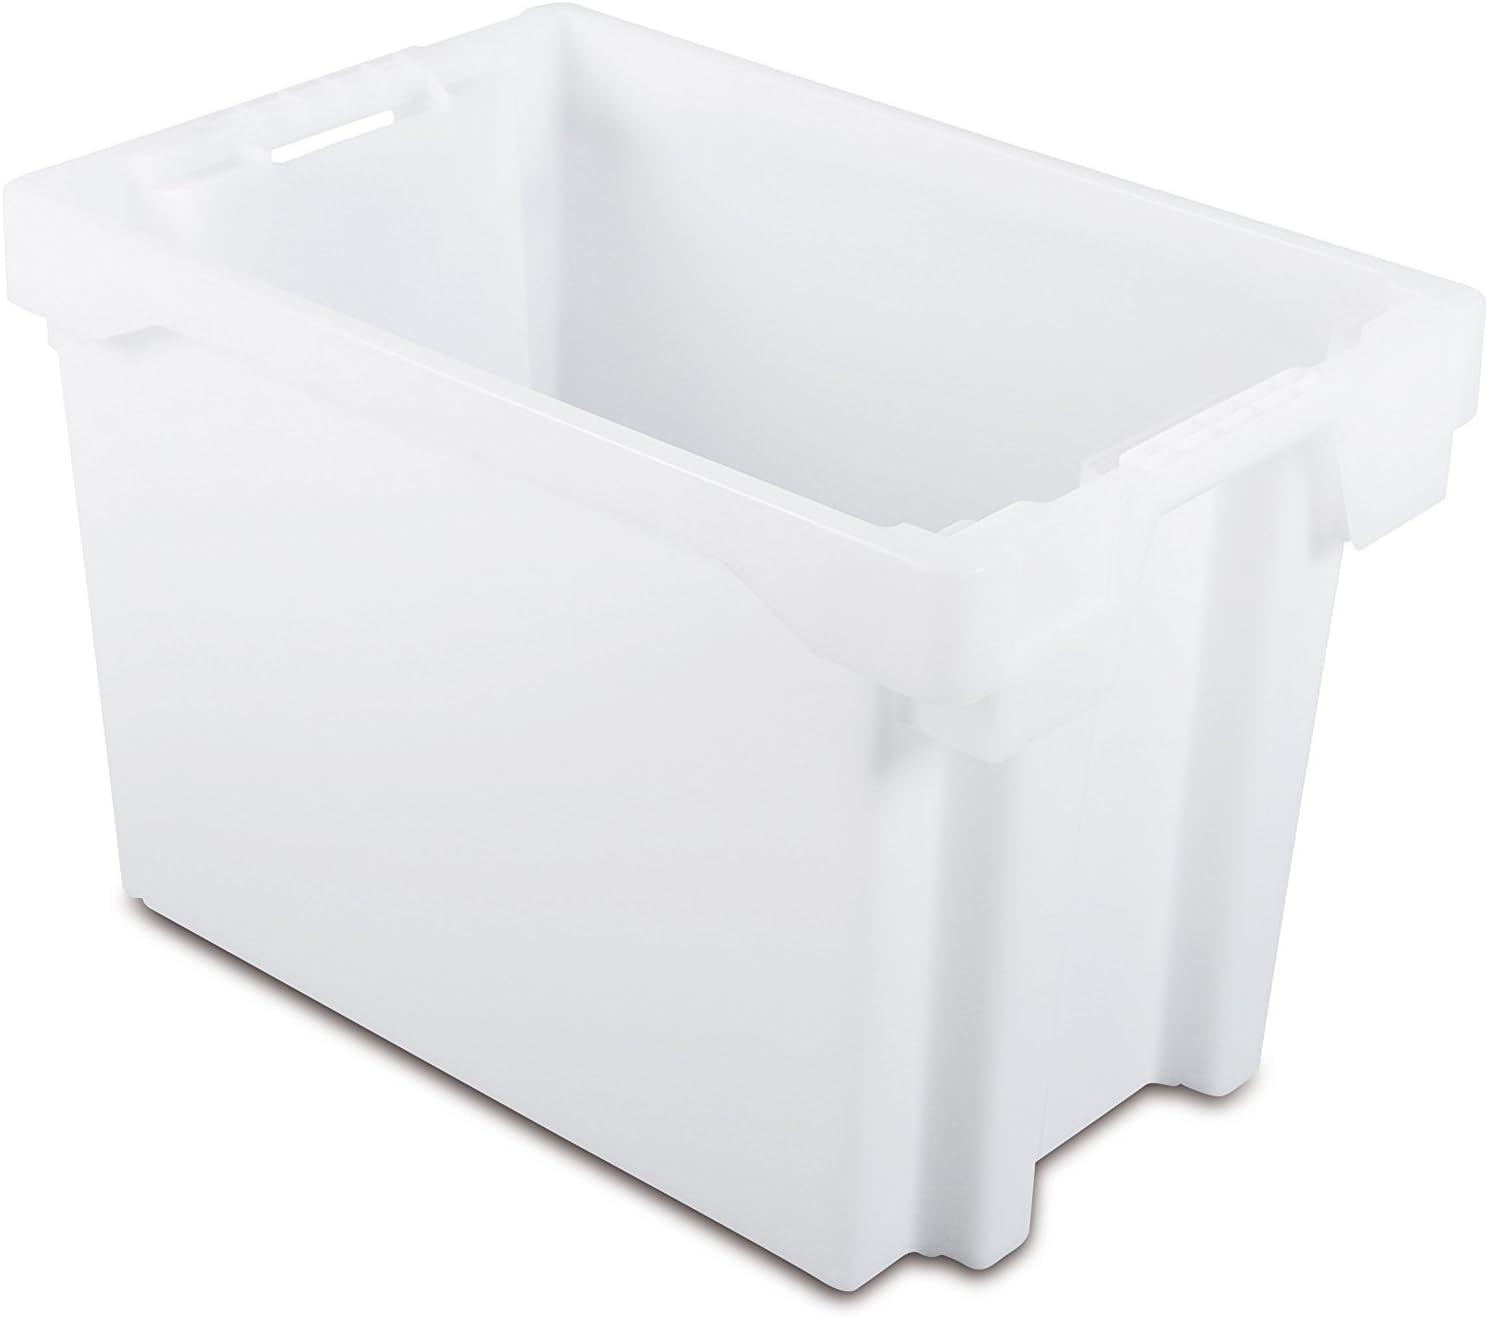 Tayg 6440-N Euro-caja para almacén y transporte 6640, Transparente, 600 x 400 x 400 mm